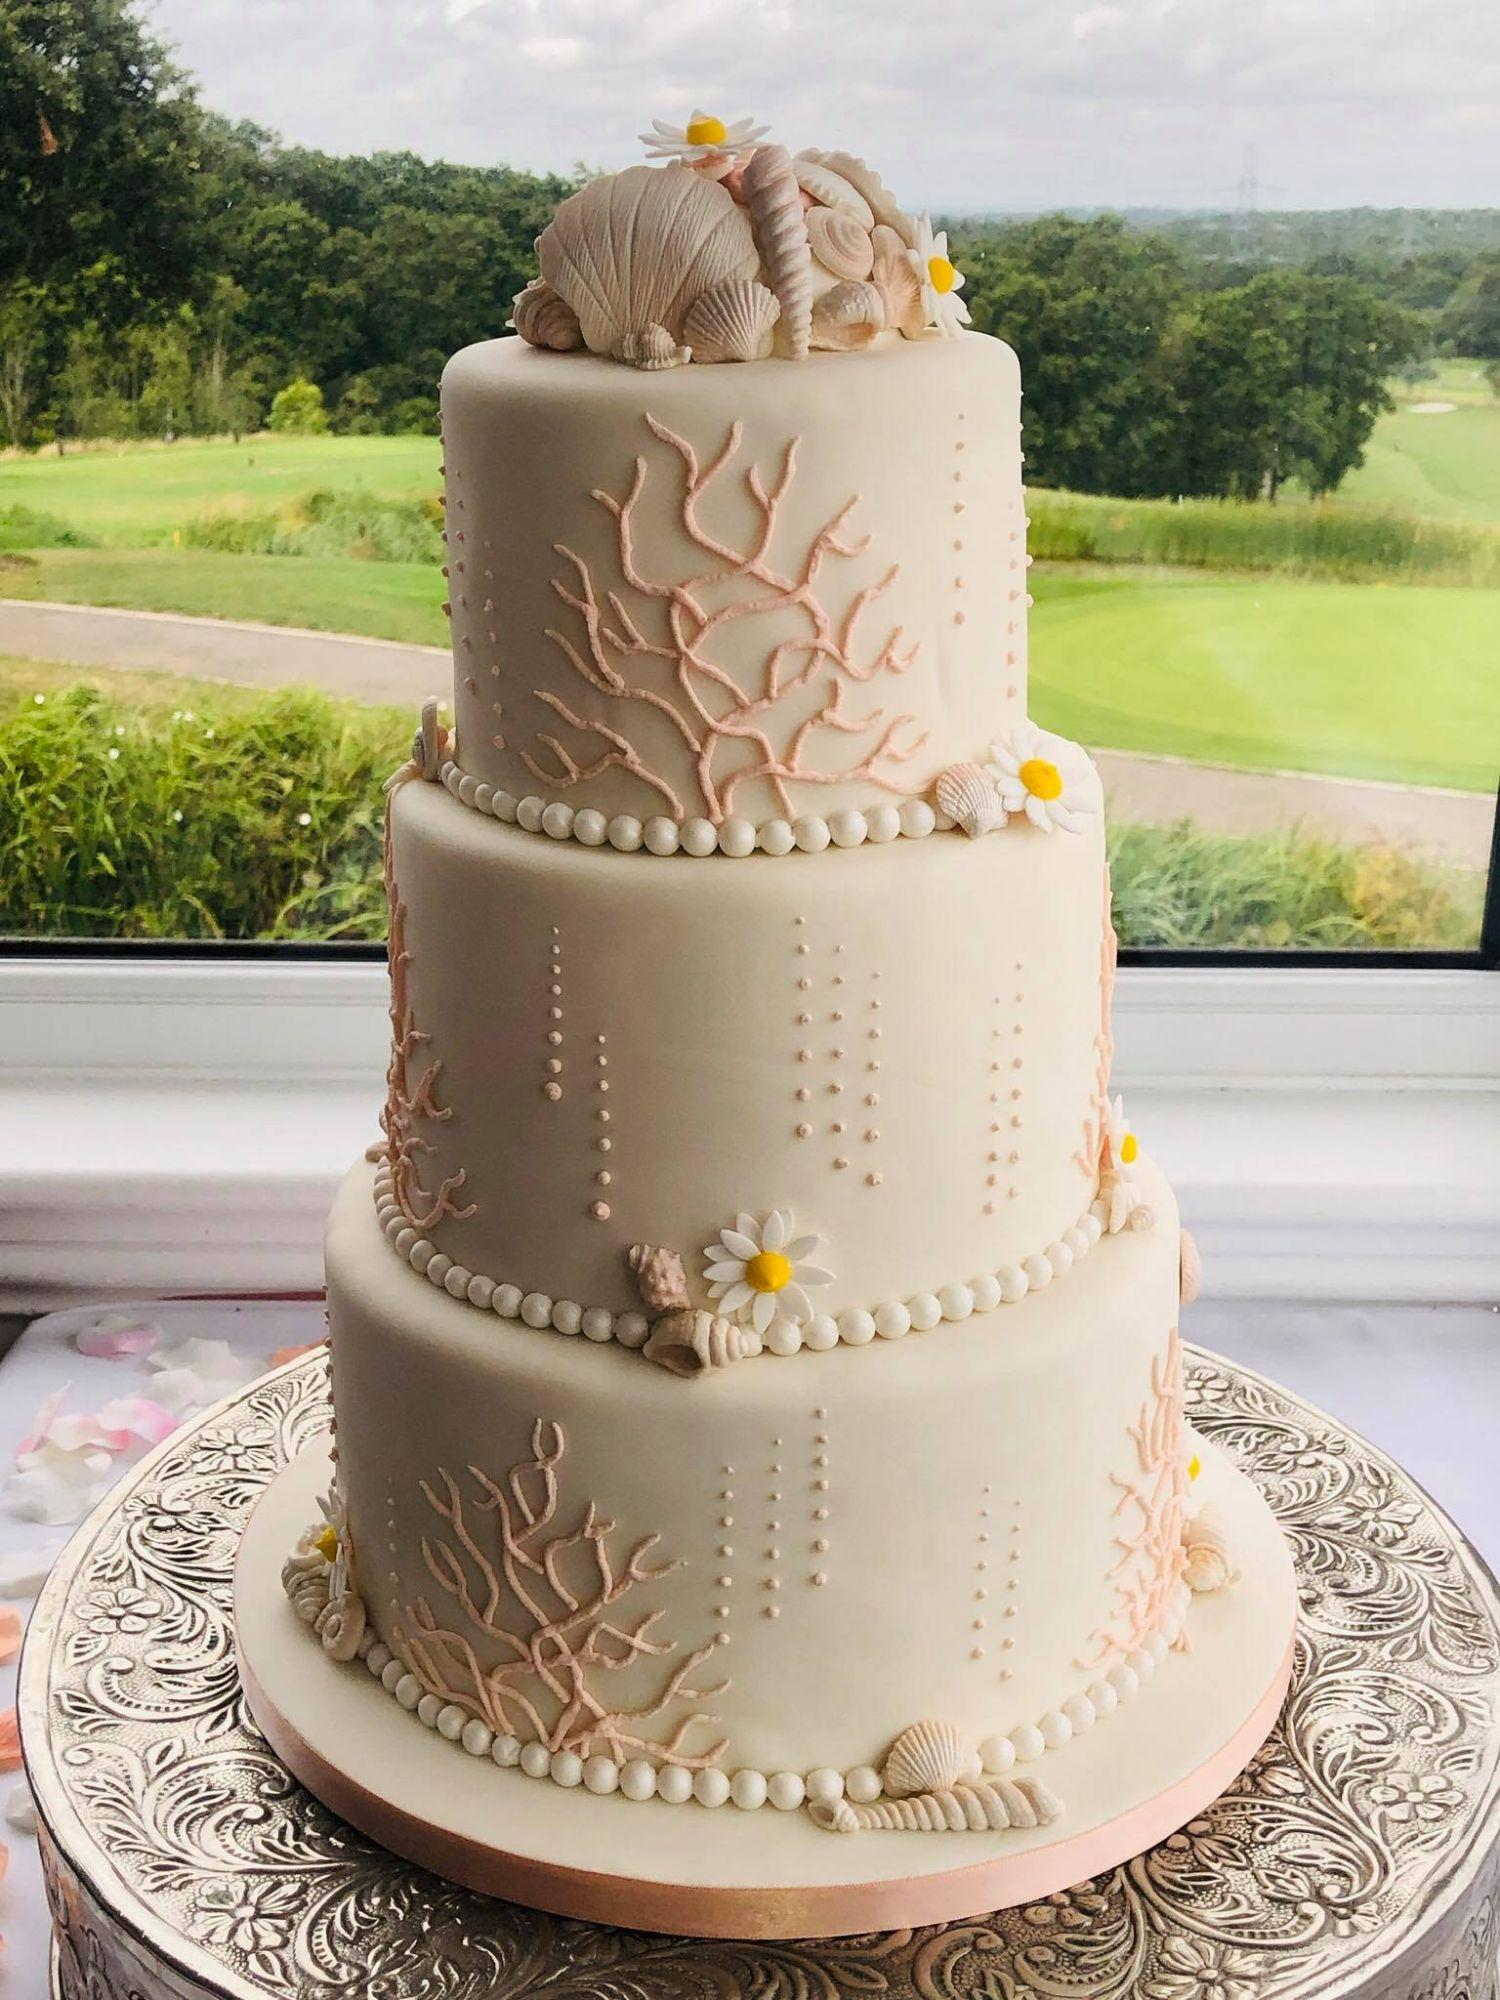 Coral and Seashells cake